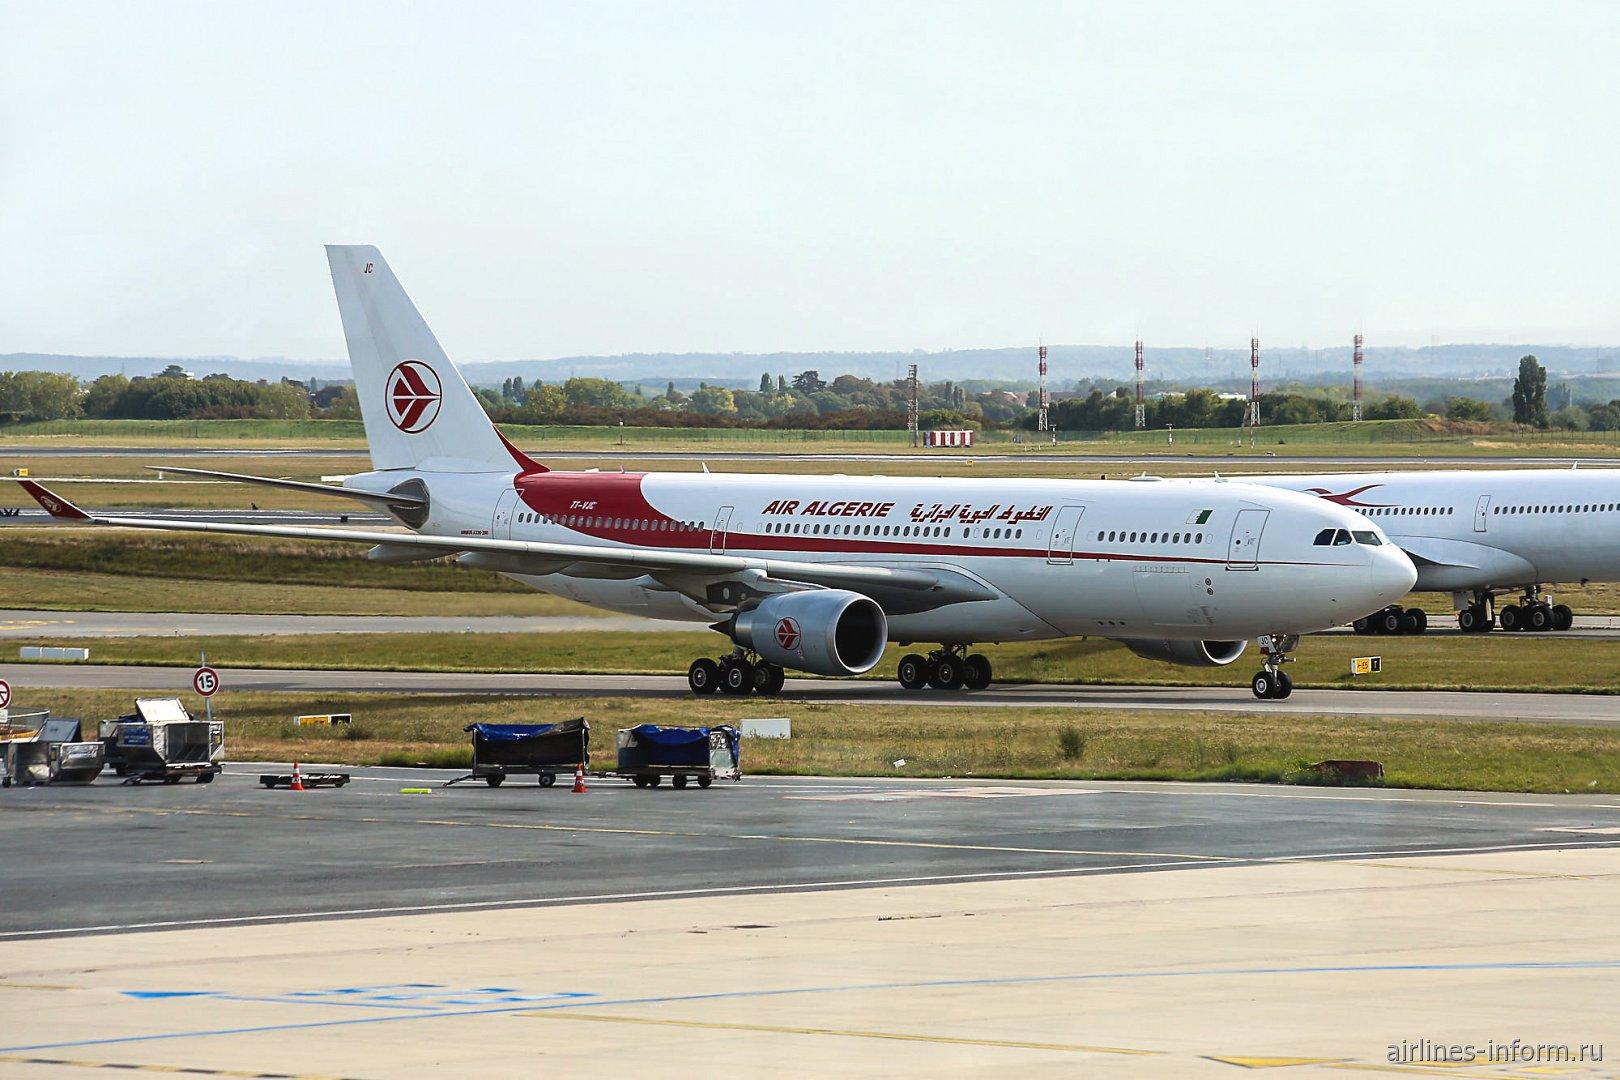 Самолет Airbus A330-200 авиакомпании Air Algerie в аэропорту Париж Шарль-де-Голль